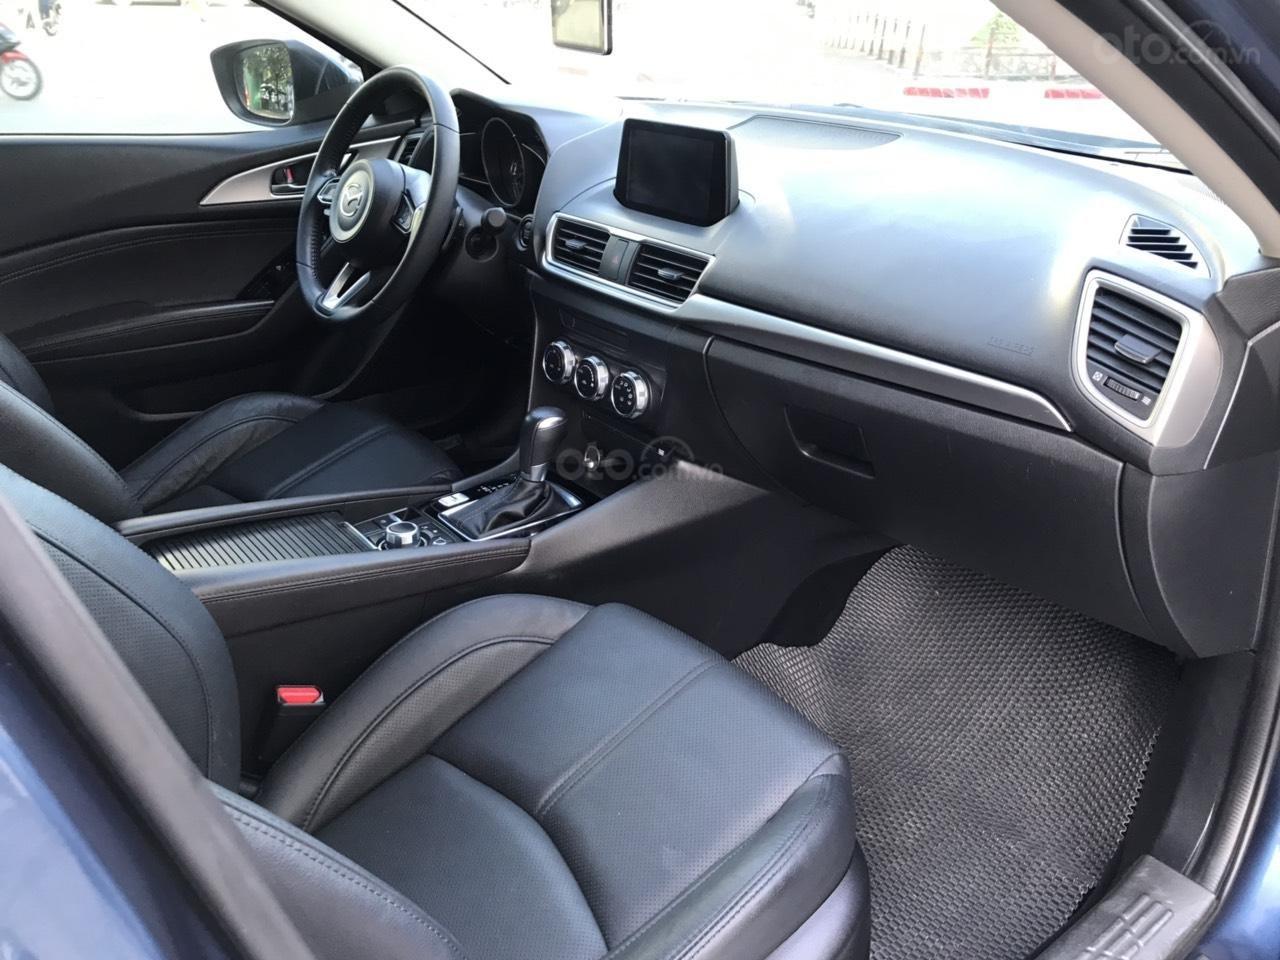 ManyCar bán Mazda 3 sedan model 2018, xe đẹp đi ít (8)